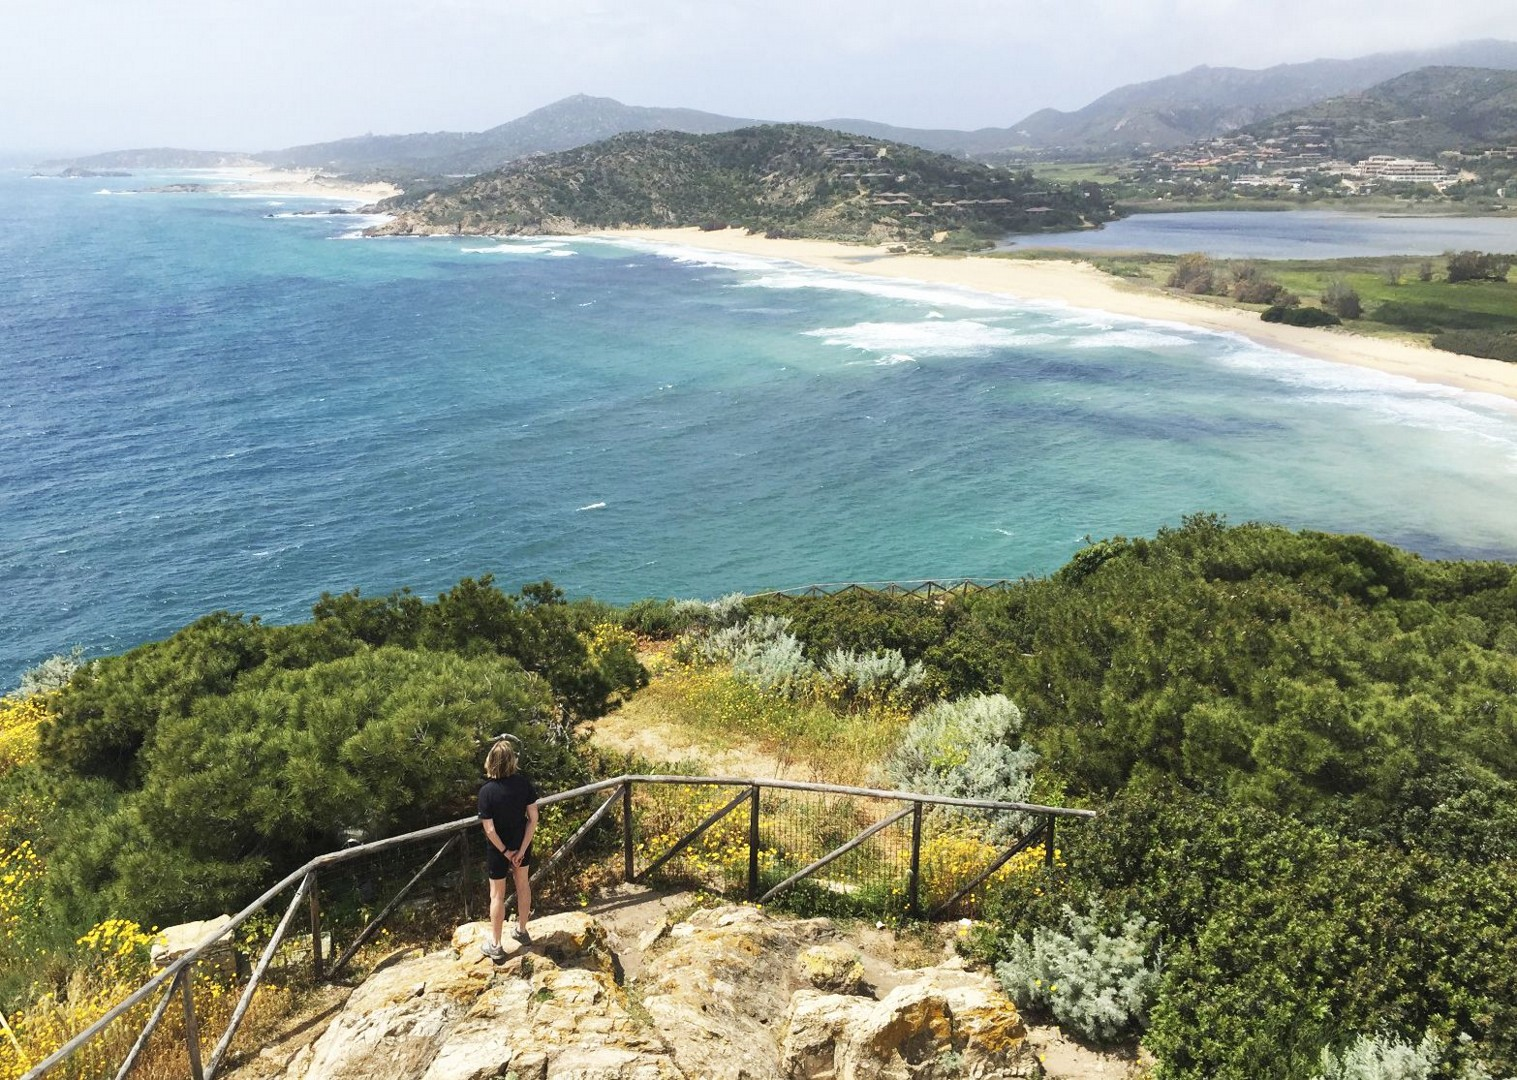 island-views-from-chia-tower-sardinia.jpg - Sardinia - Island Flavours - Guided Leisure Cycling Holiday - Leisure Cycling